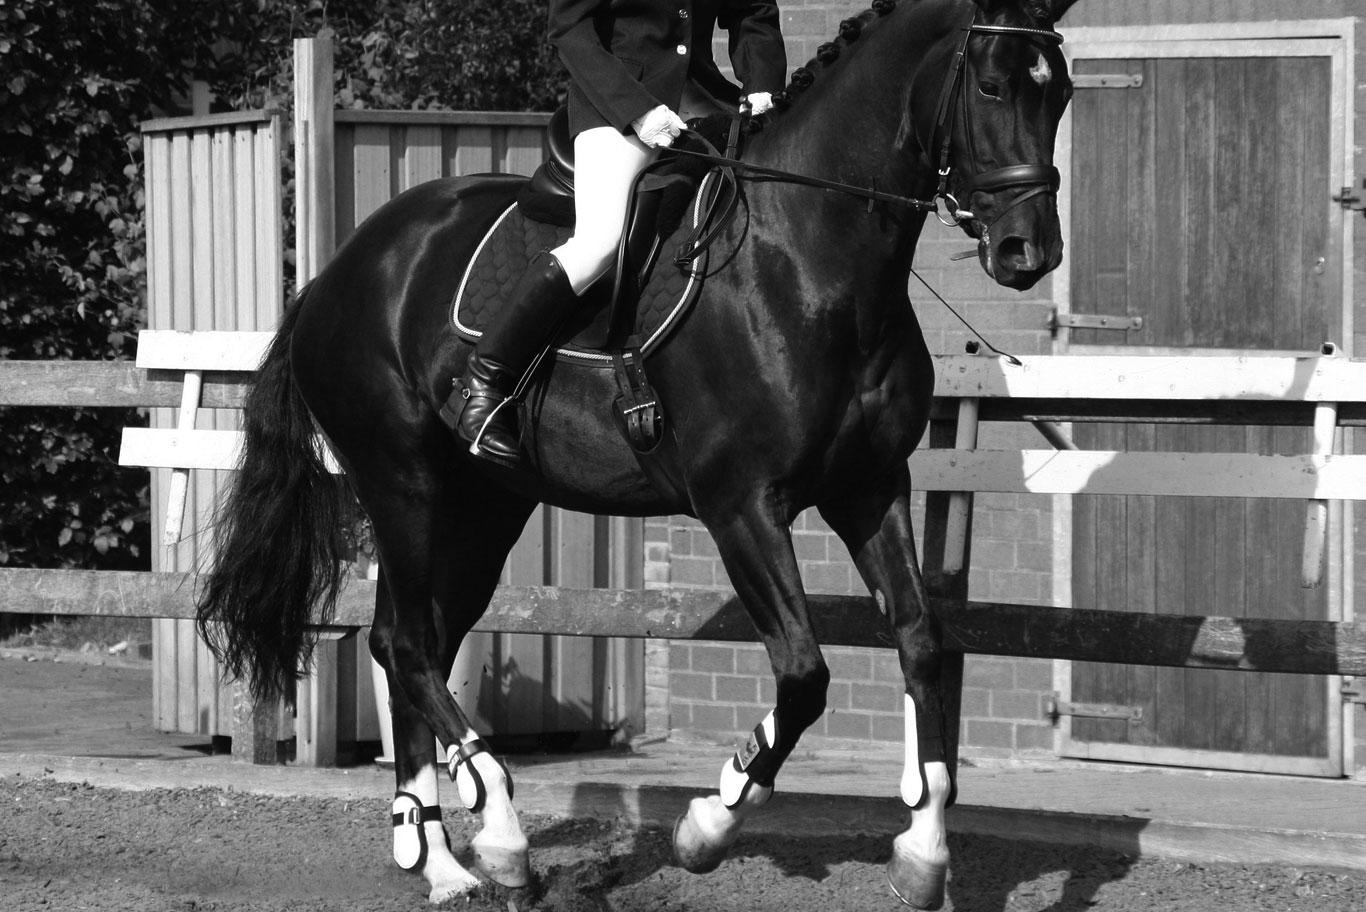 Sunday 17th September 2017 - White Horse Farm Equestrian Centre